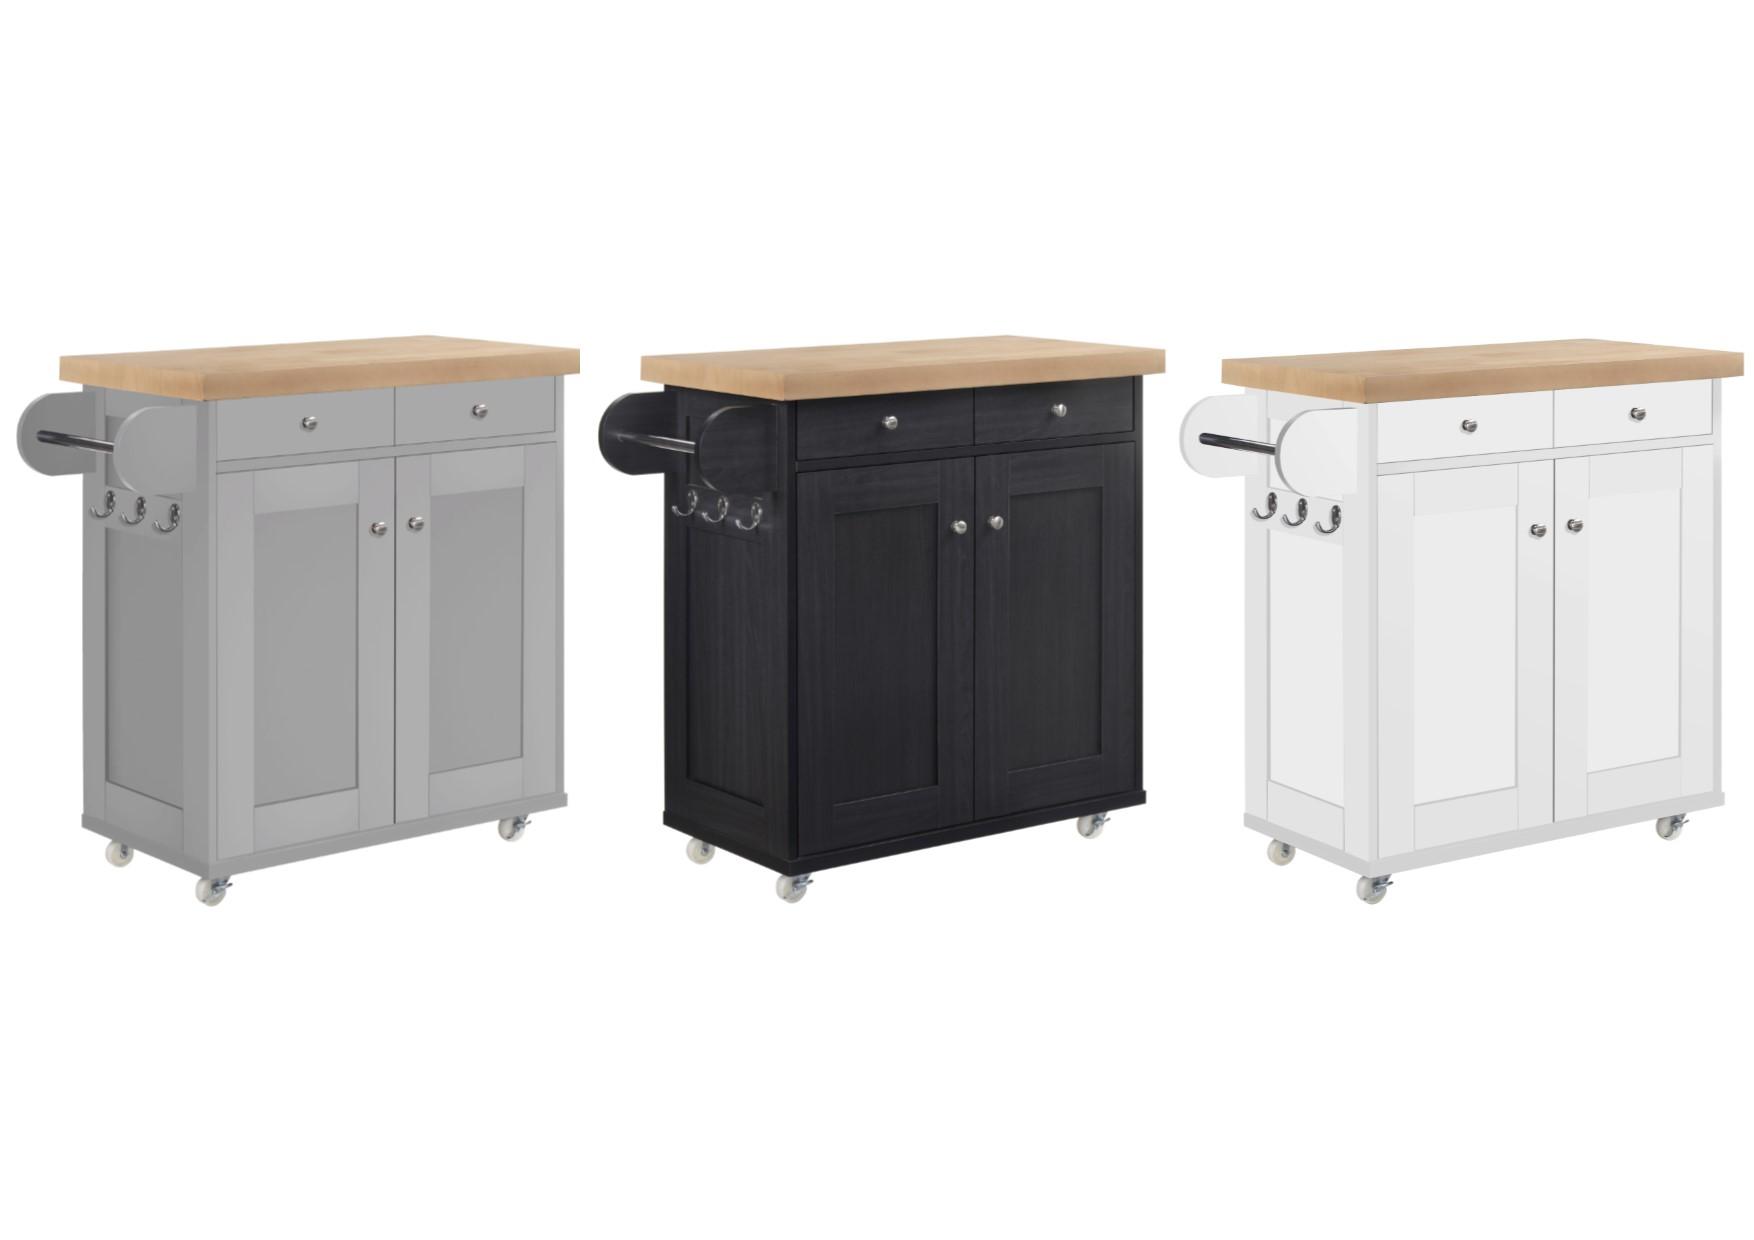 Image of: Lpd Portland Portable Kitchen Island Cart With Storage White Soft Grey Black Ebay